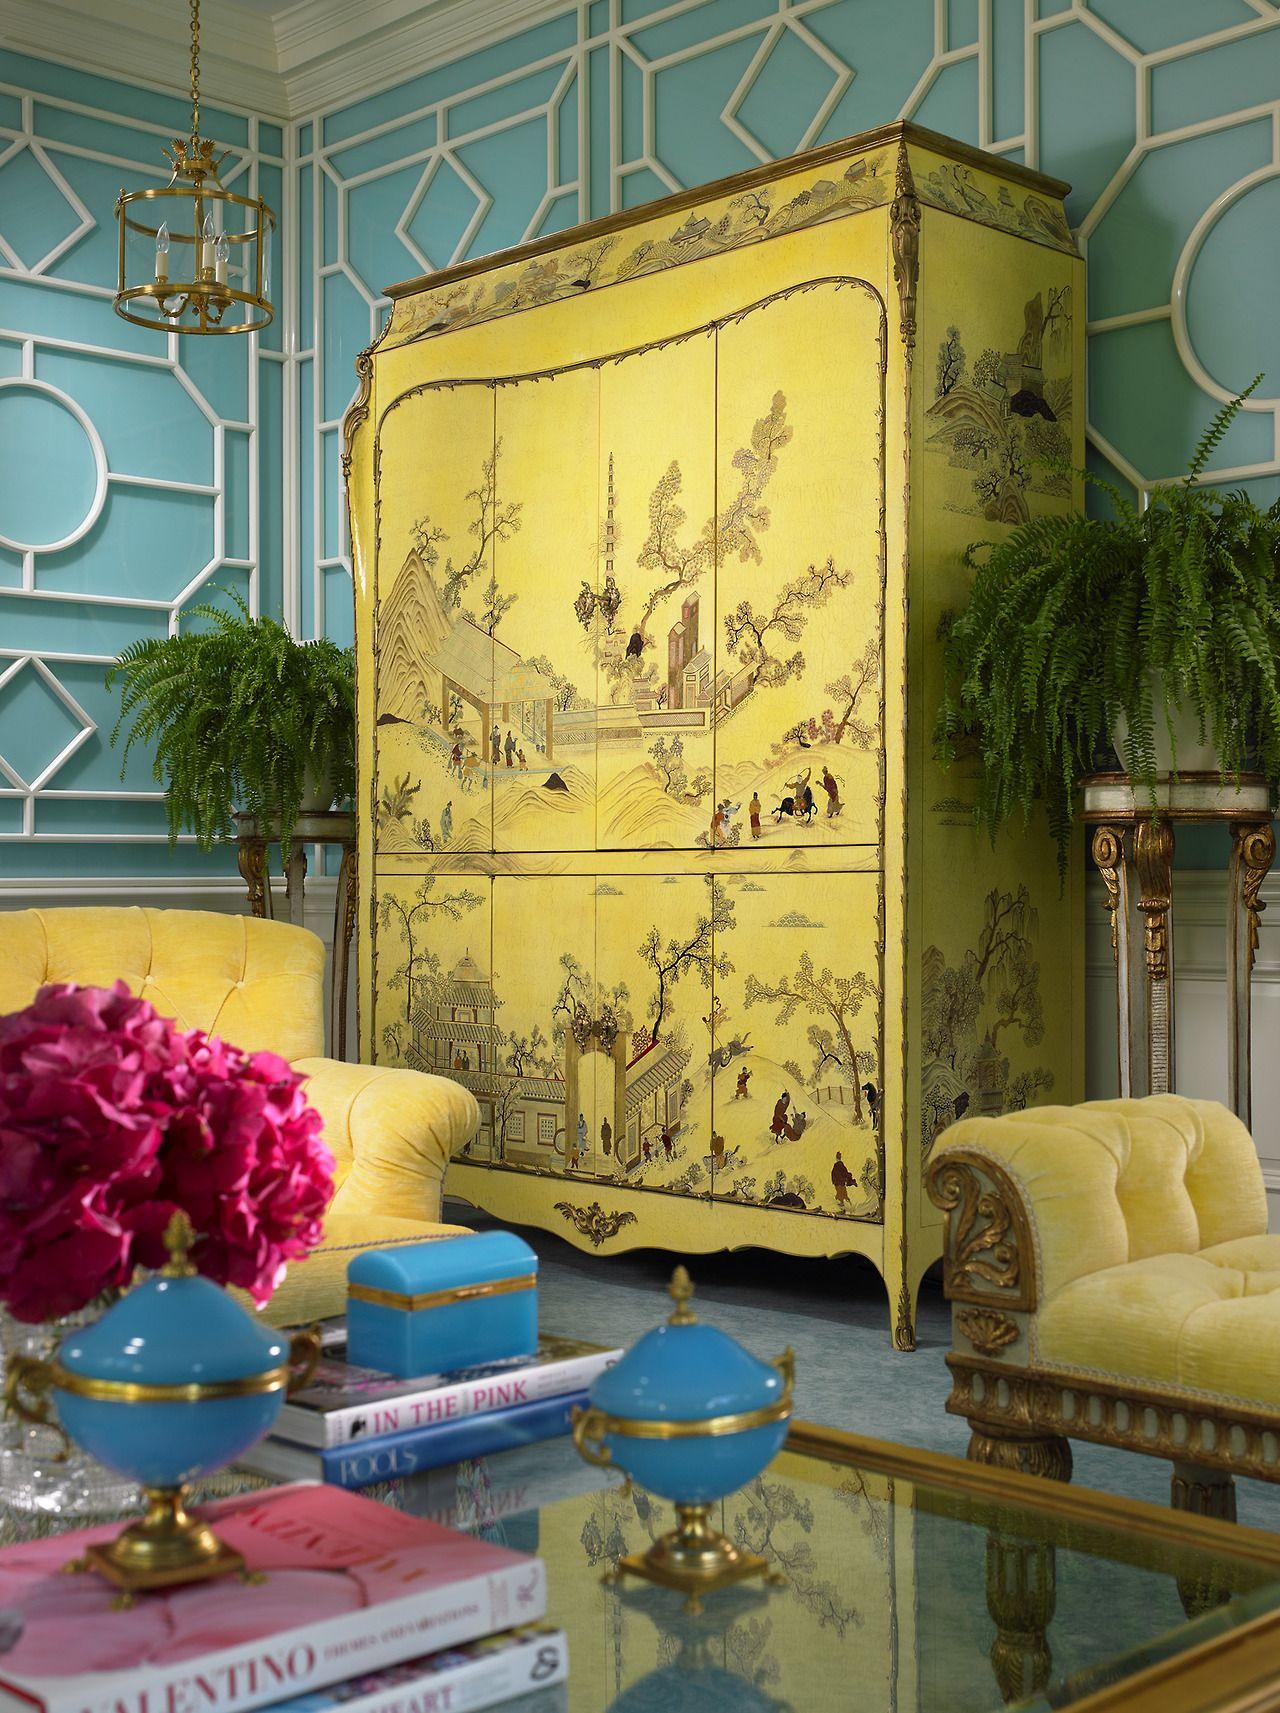 armoire -thehandbookauthority: from Scott Snyder | Design & Decor ...